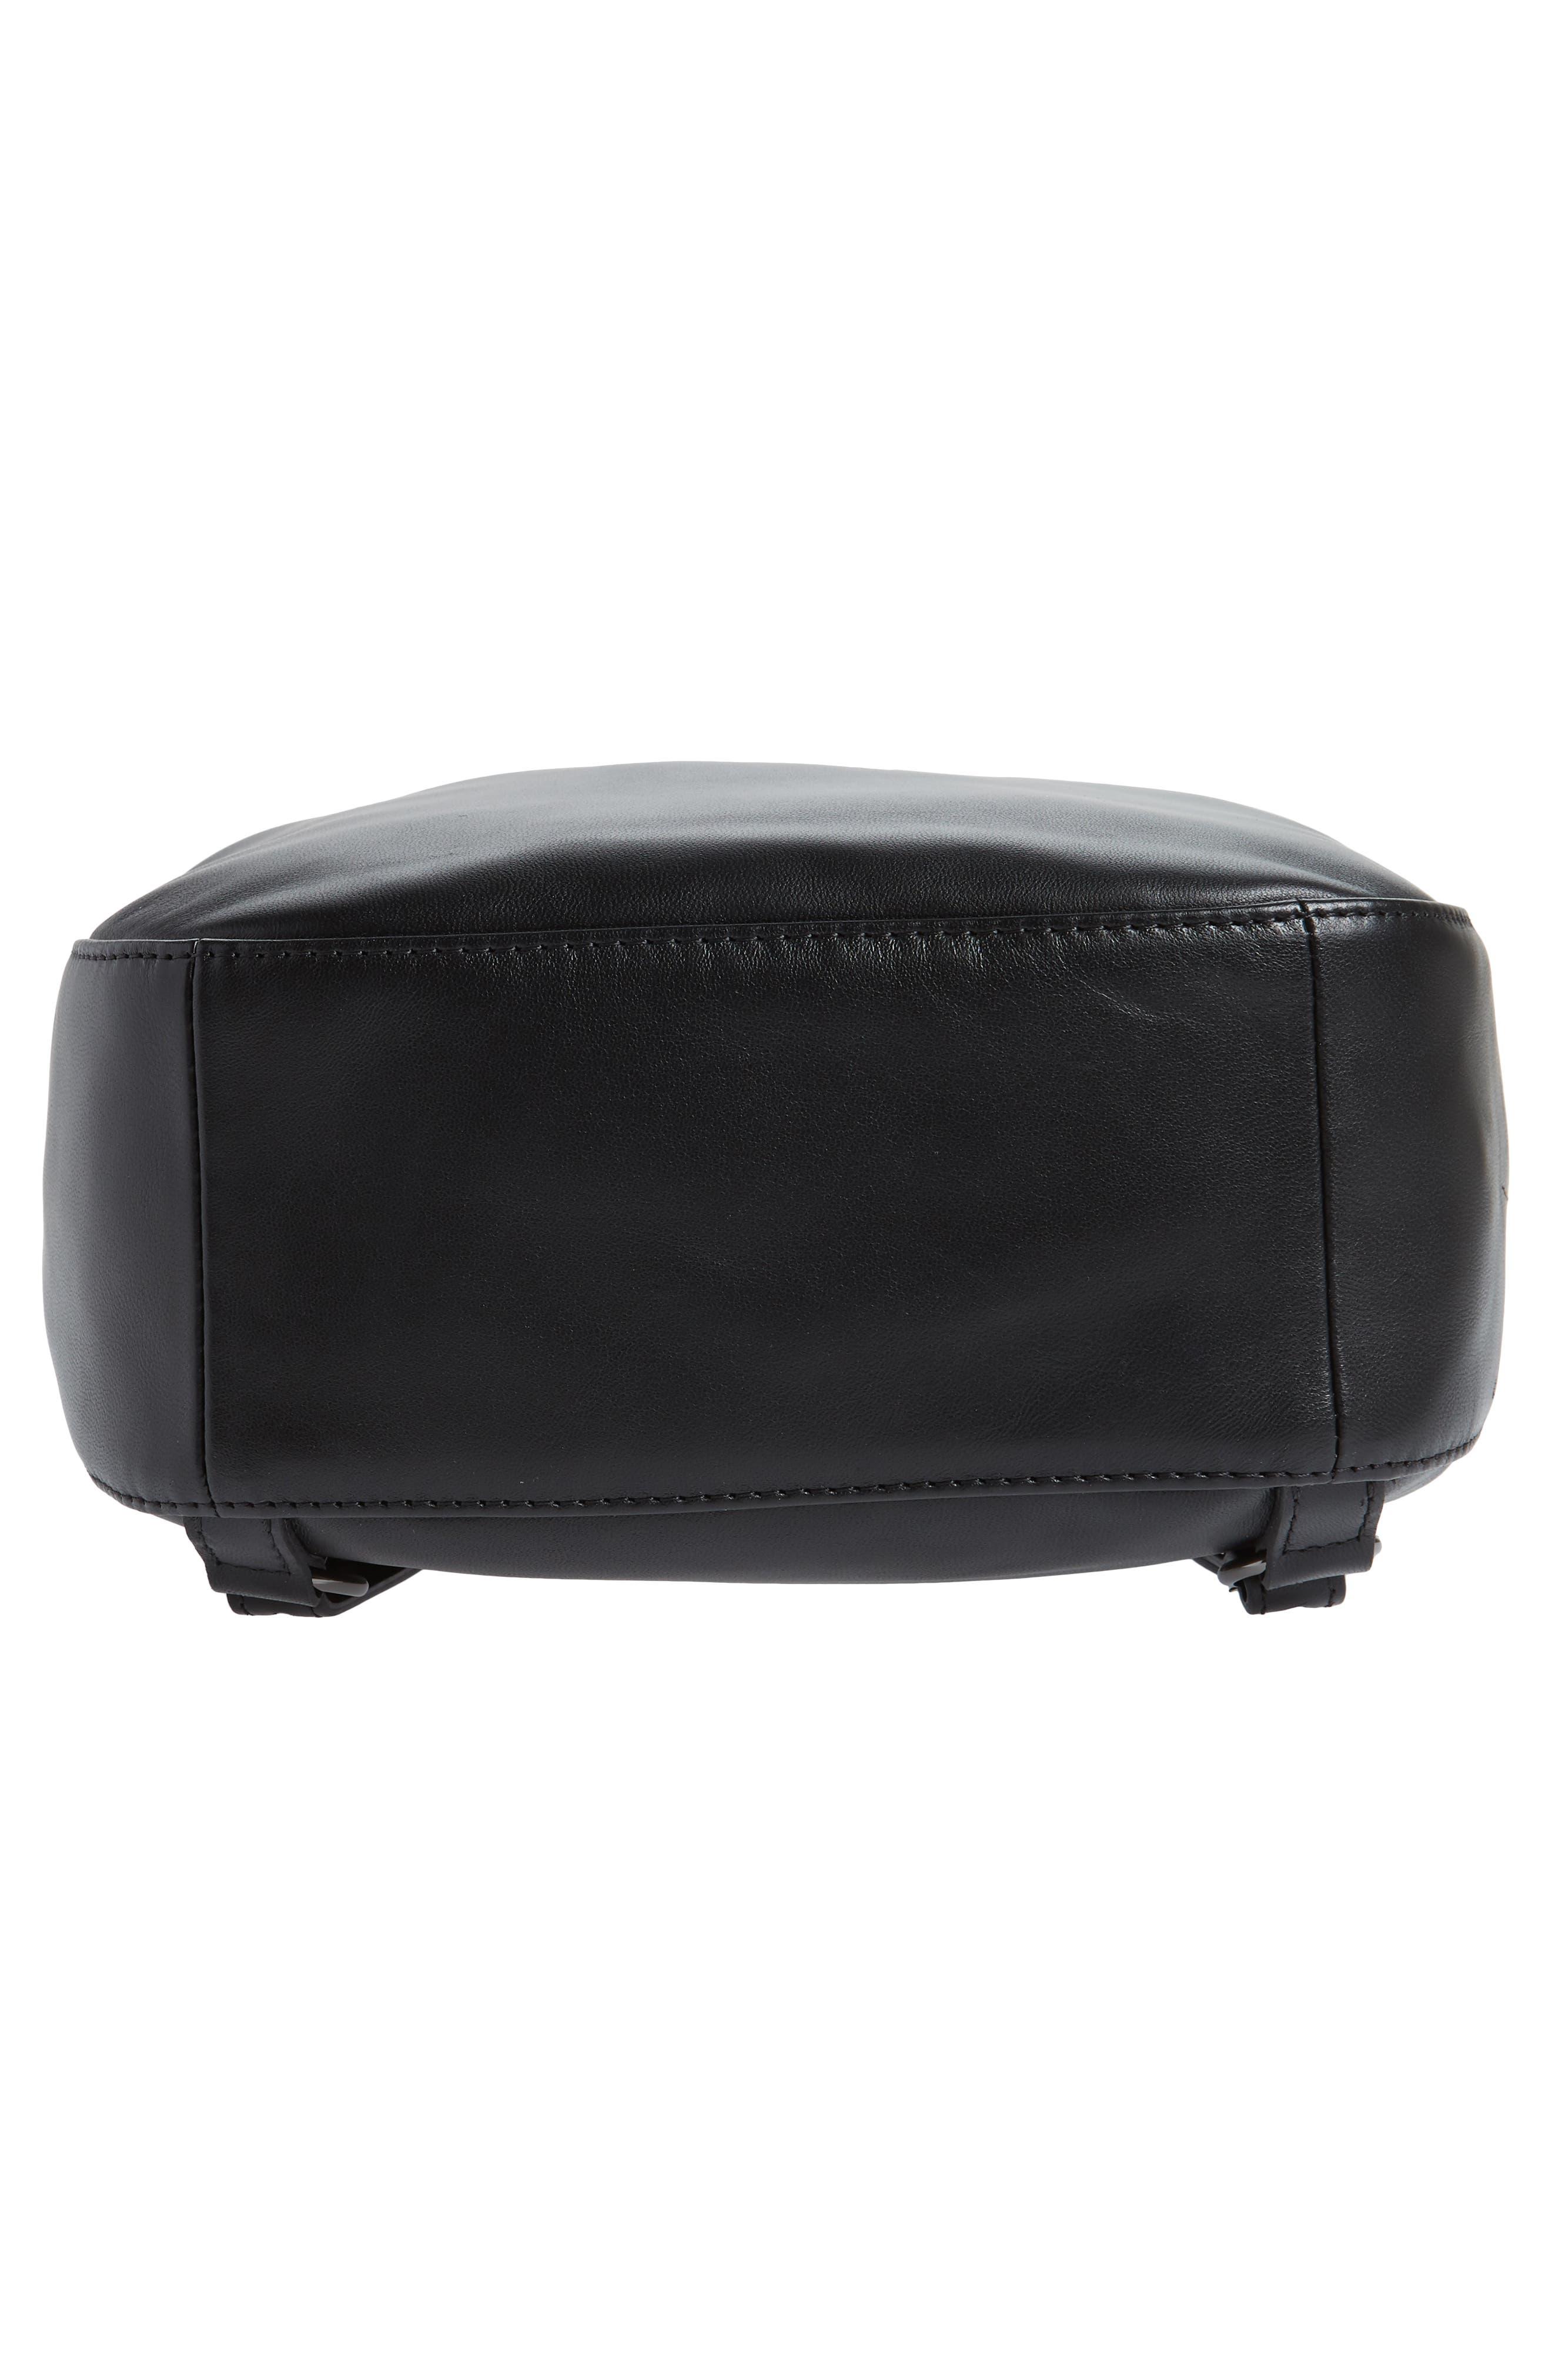 Cavalcade Leather Backpack,                             Alternate thumbnail 6, color,                             BLACK